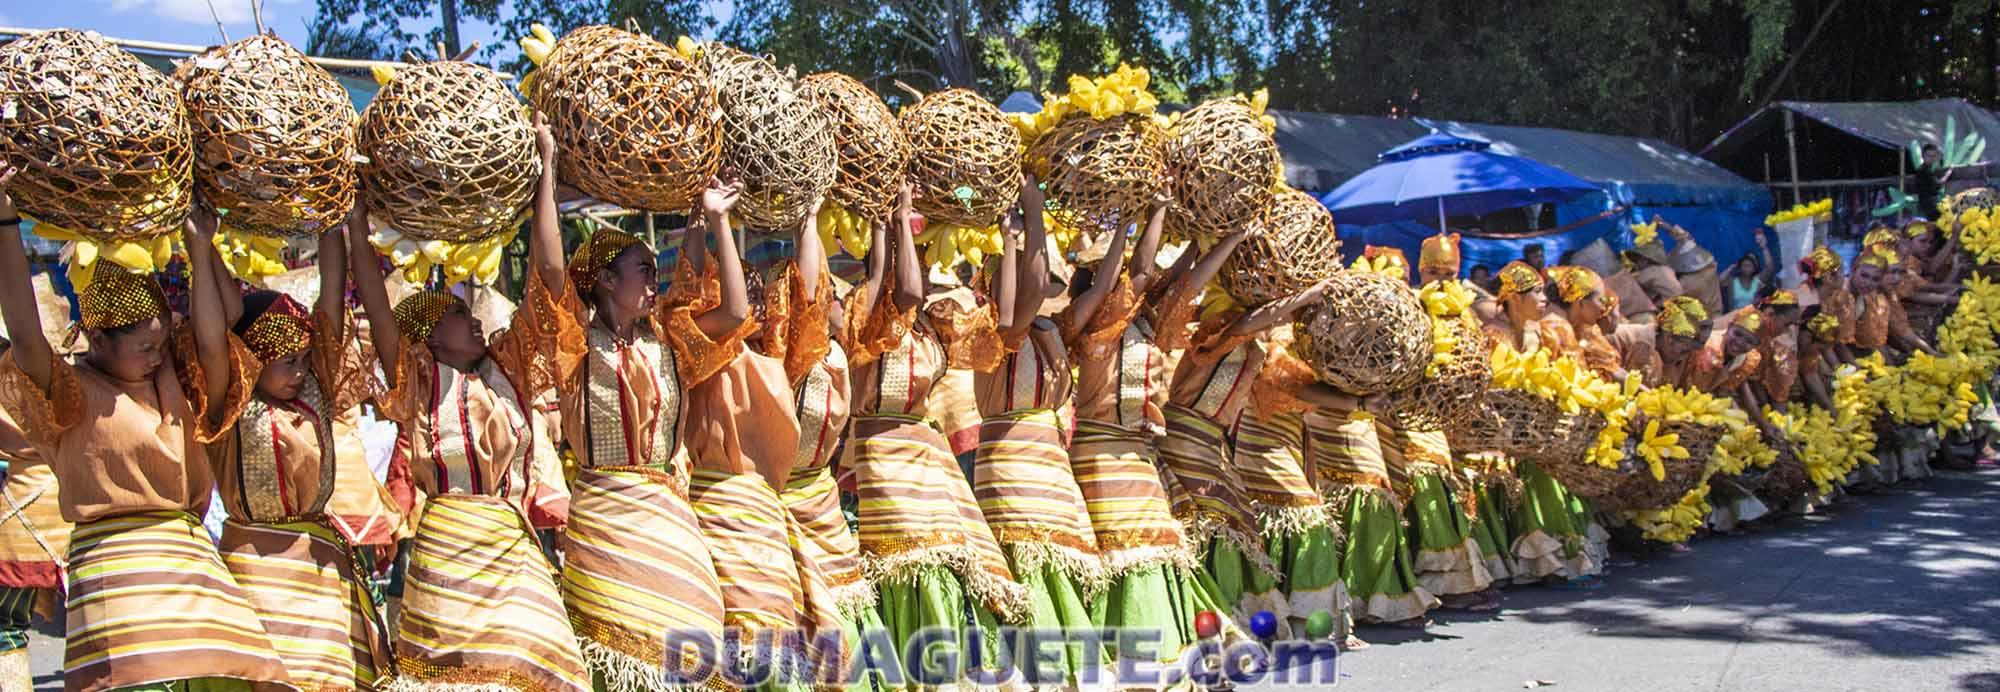 Pakol Festival 2019 - Santa Catalina